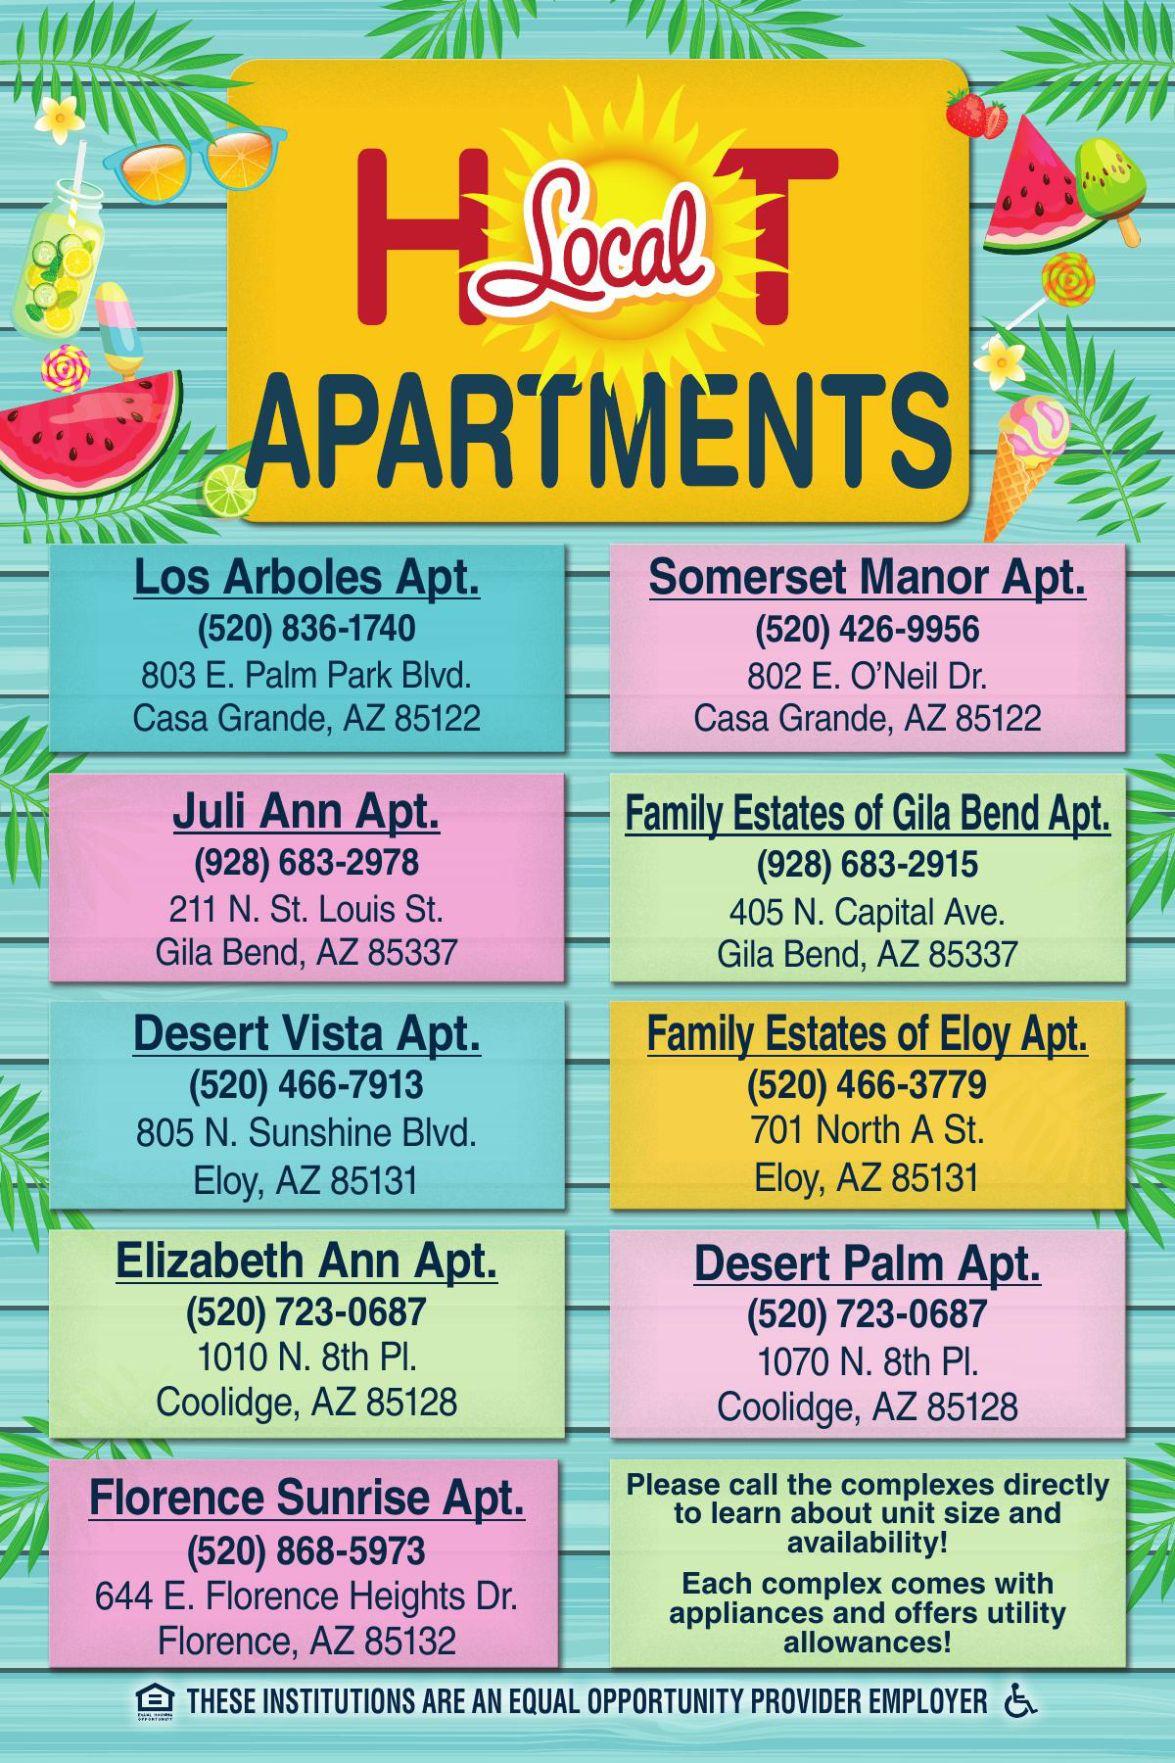 Hot Local Apartments - Landmark Apartments